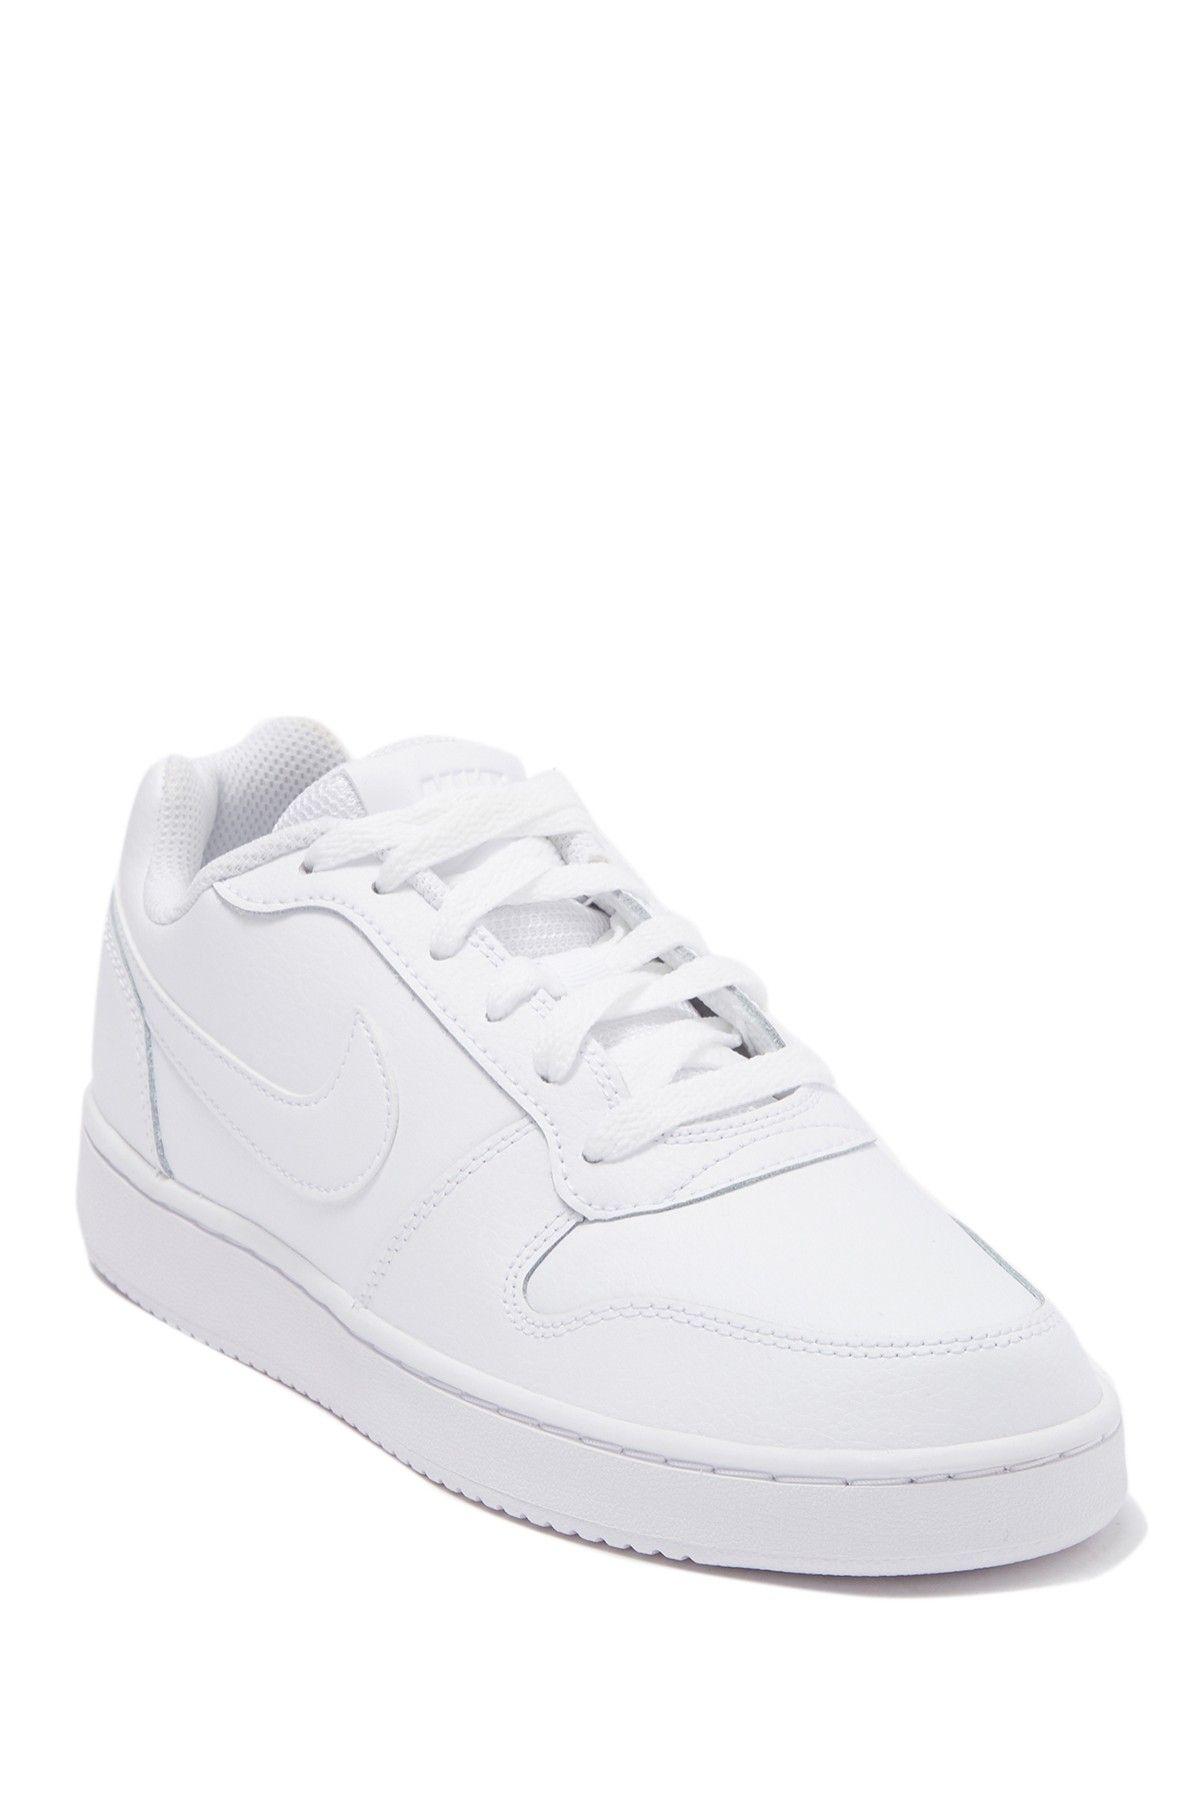 Nike | Ebernon Low Sneaker #nordstromrack